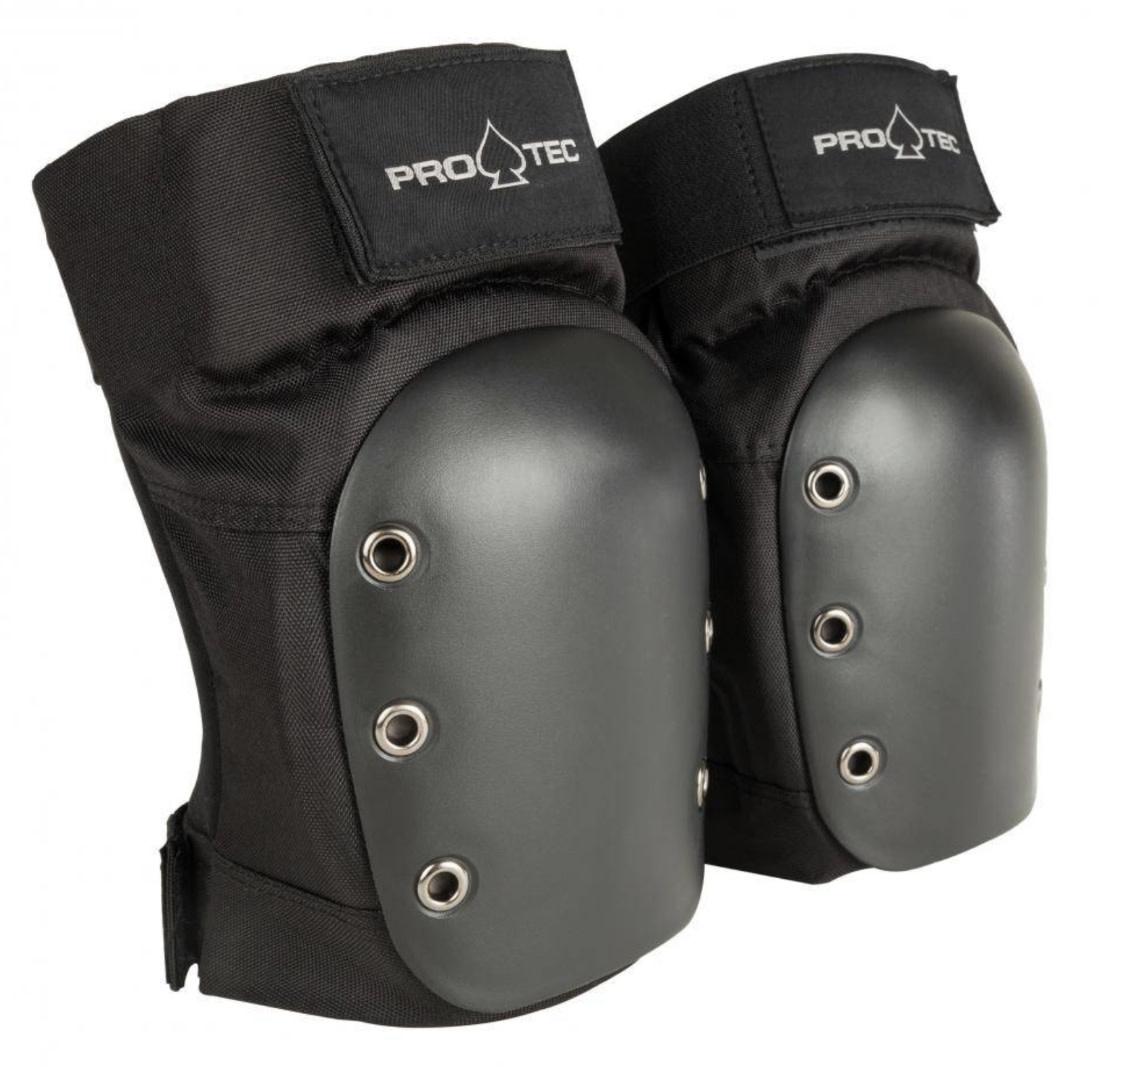 Protec Protec - Street Knee Black